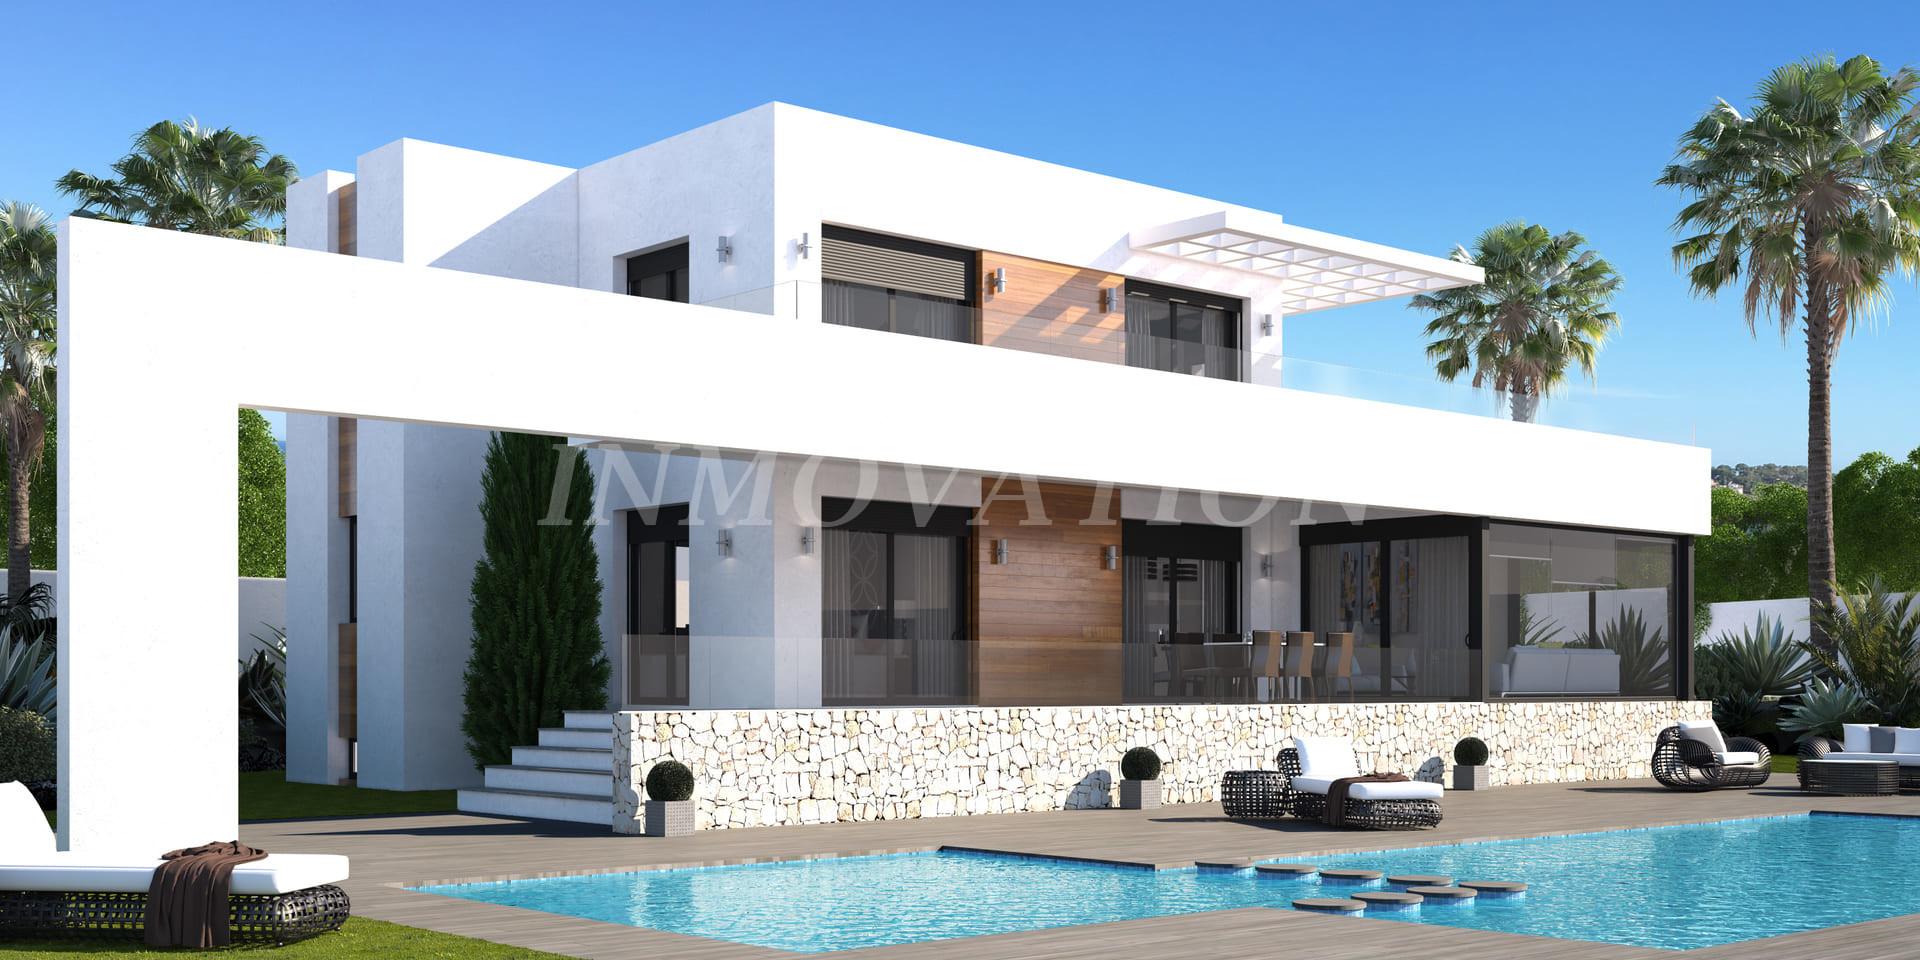 New Modern Villa Design in Denia